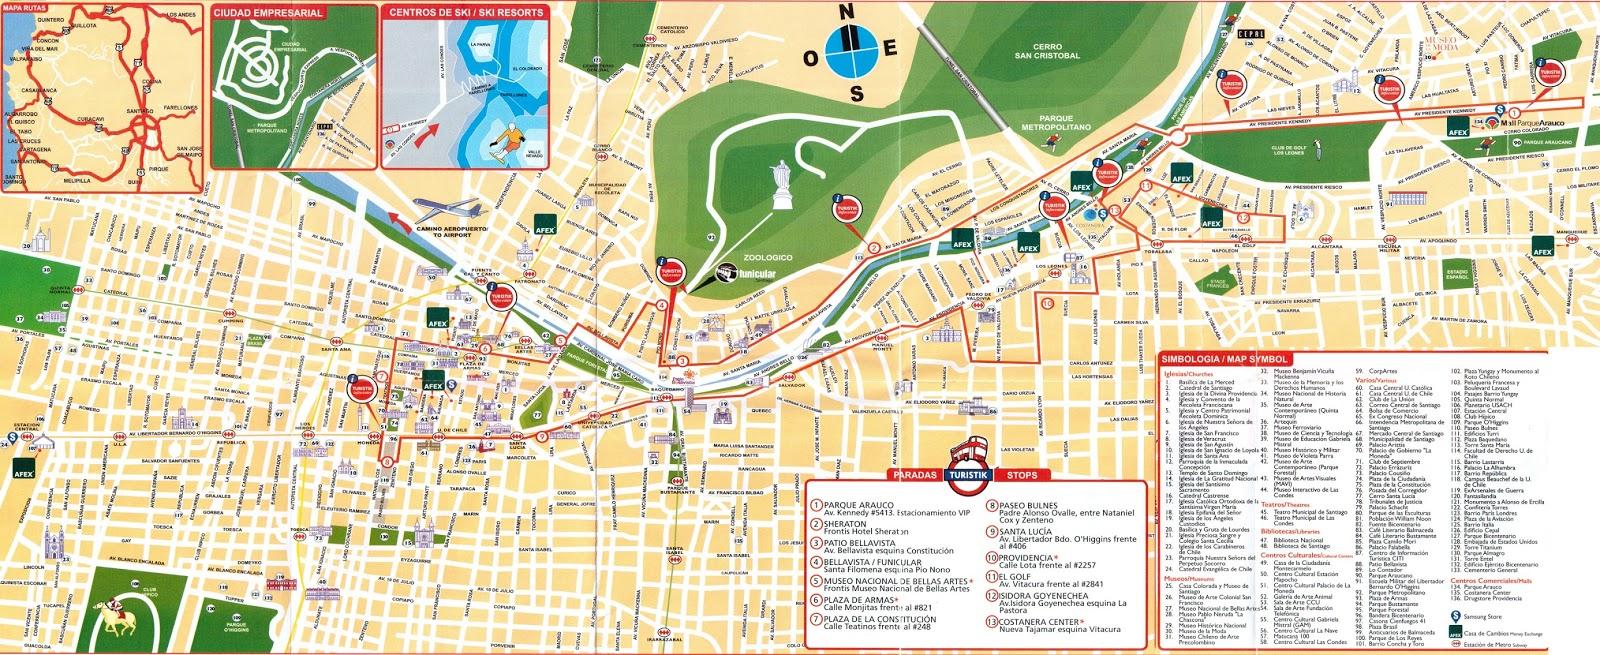 Mapa turistico santiago do chile for Calles de santiago de chile